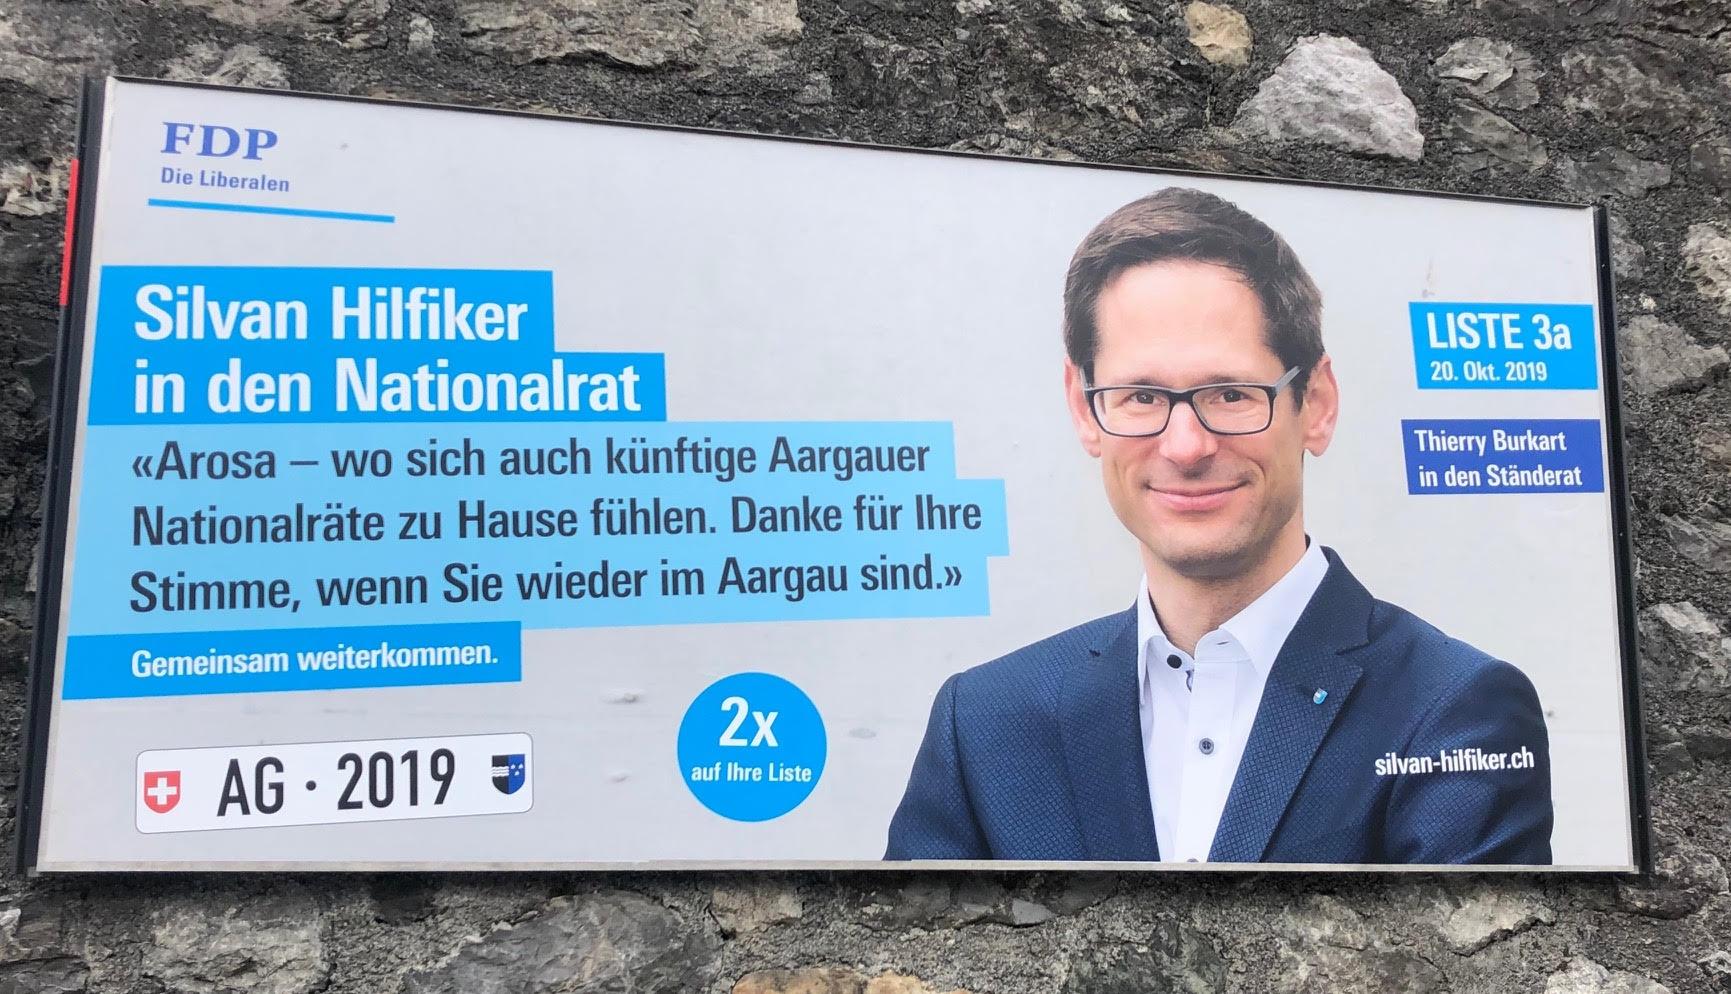 Vom Aargau via Arosa nach Bern?